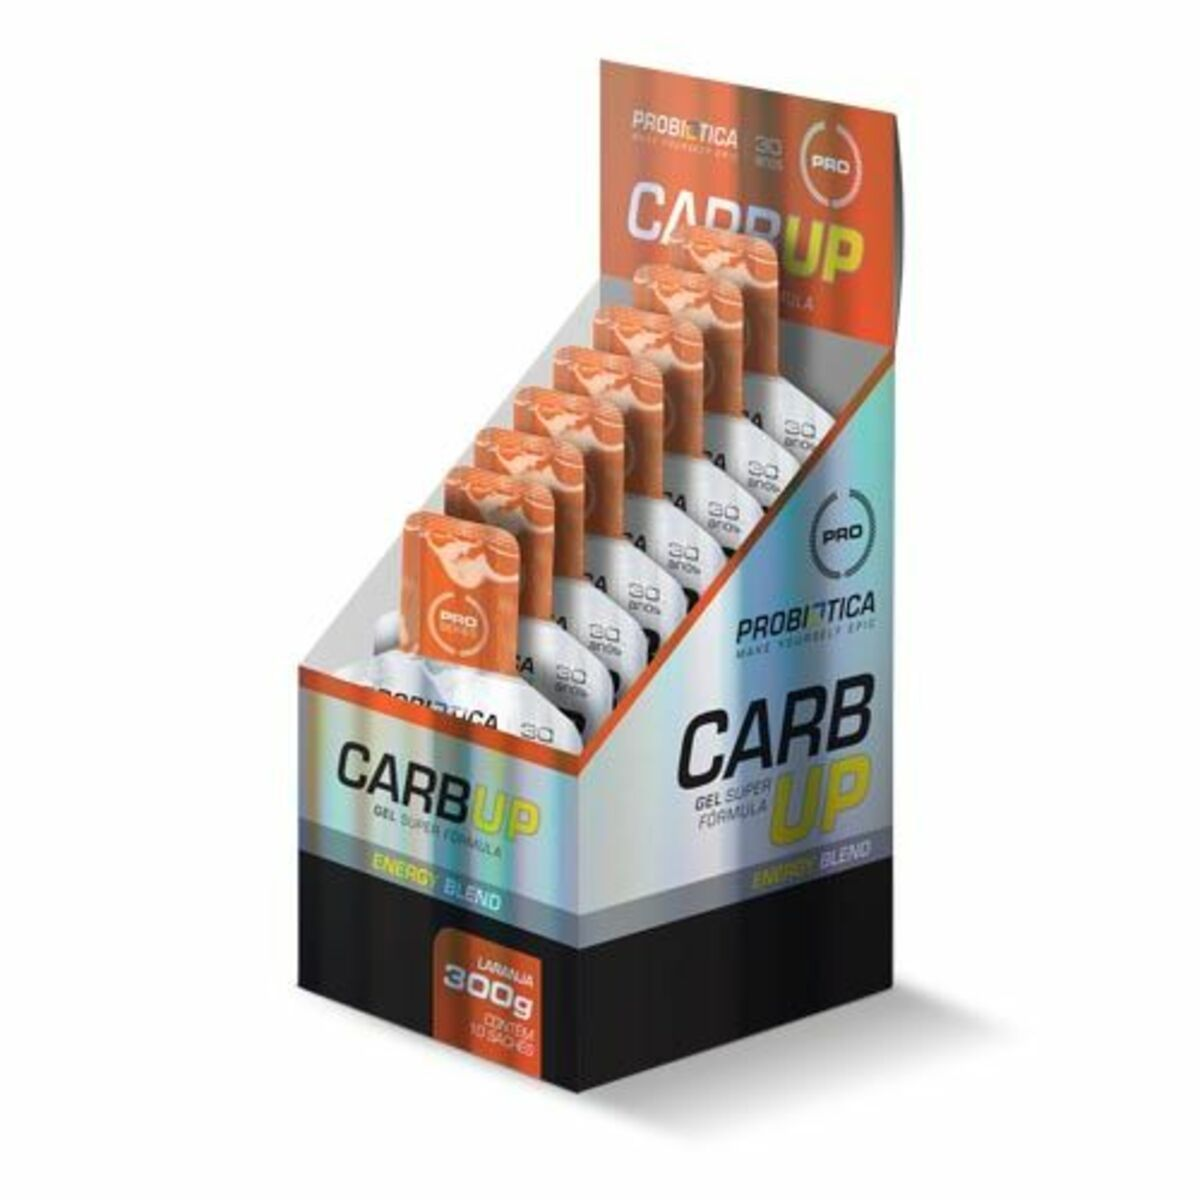 Carb Up Black Gel Caixa 10 Sachês de 30g Probiótica Laranja  - KFit Nutrition